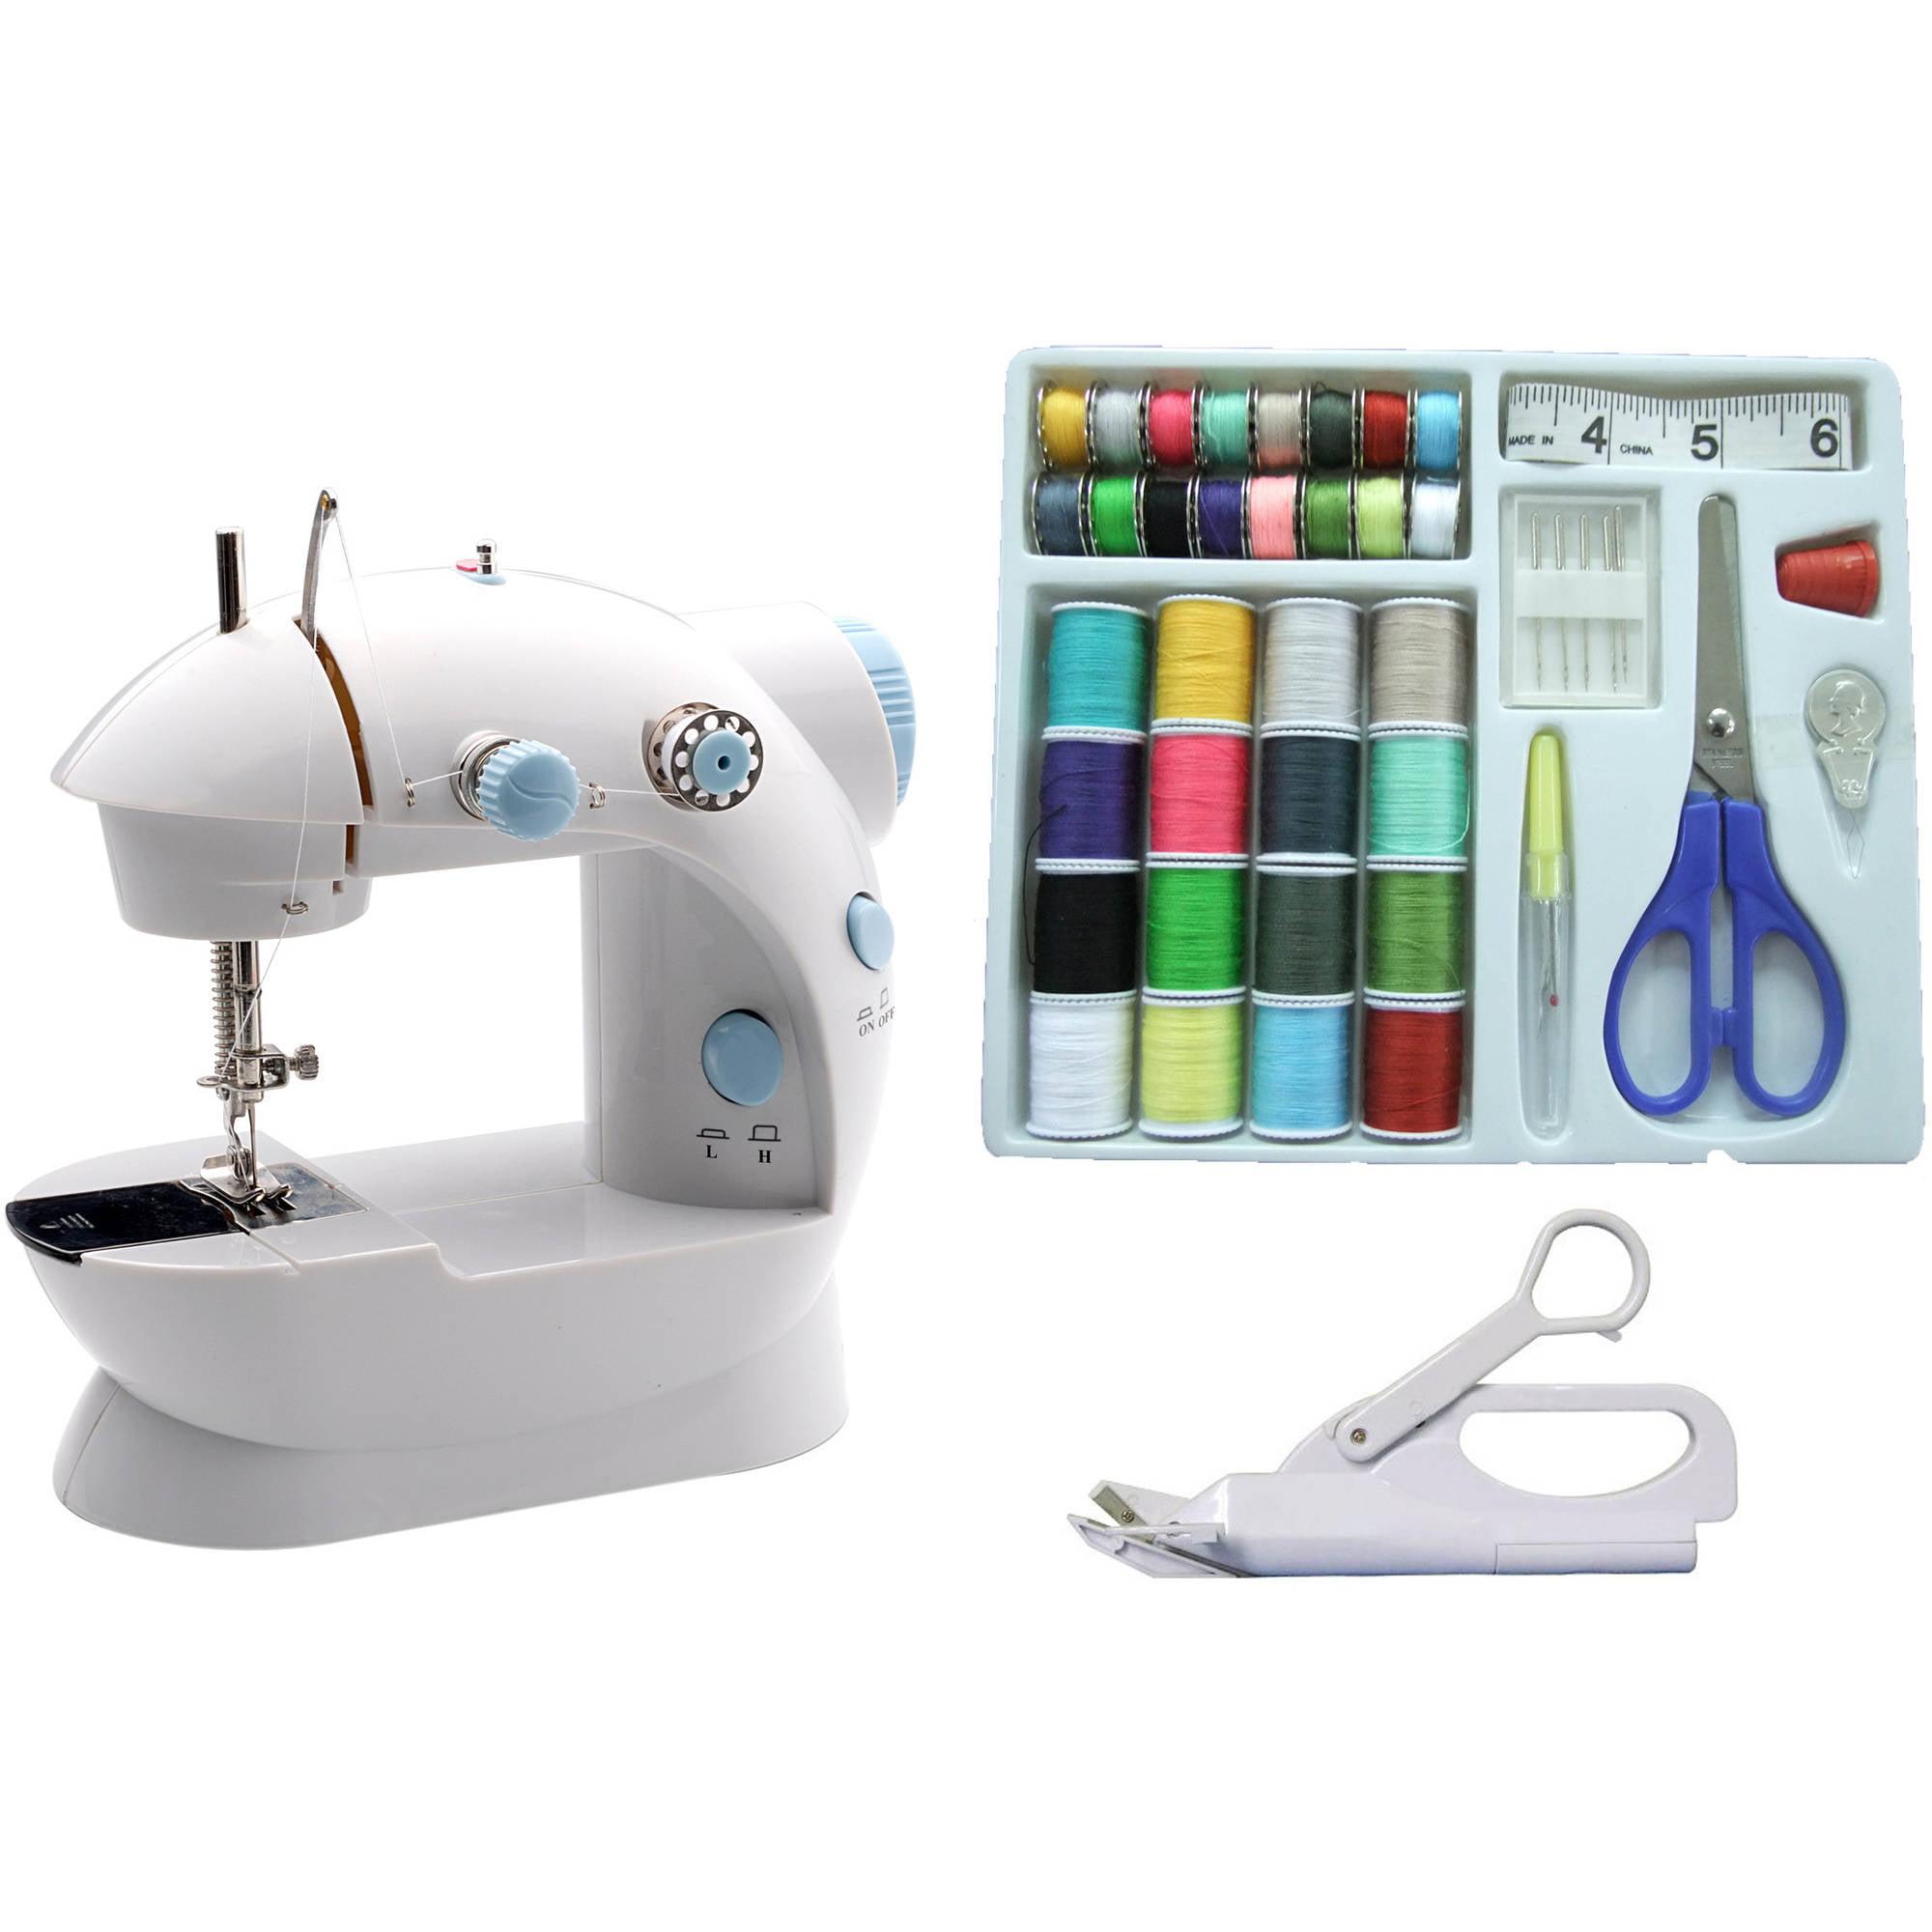 Michley Mini Sewing Machine & Accessories 3-Piece Value Bundle